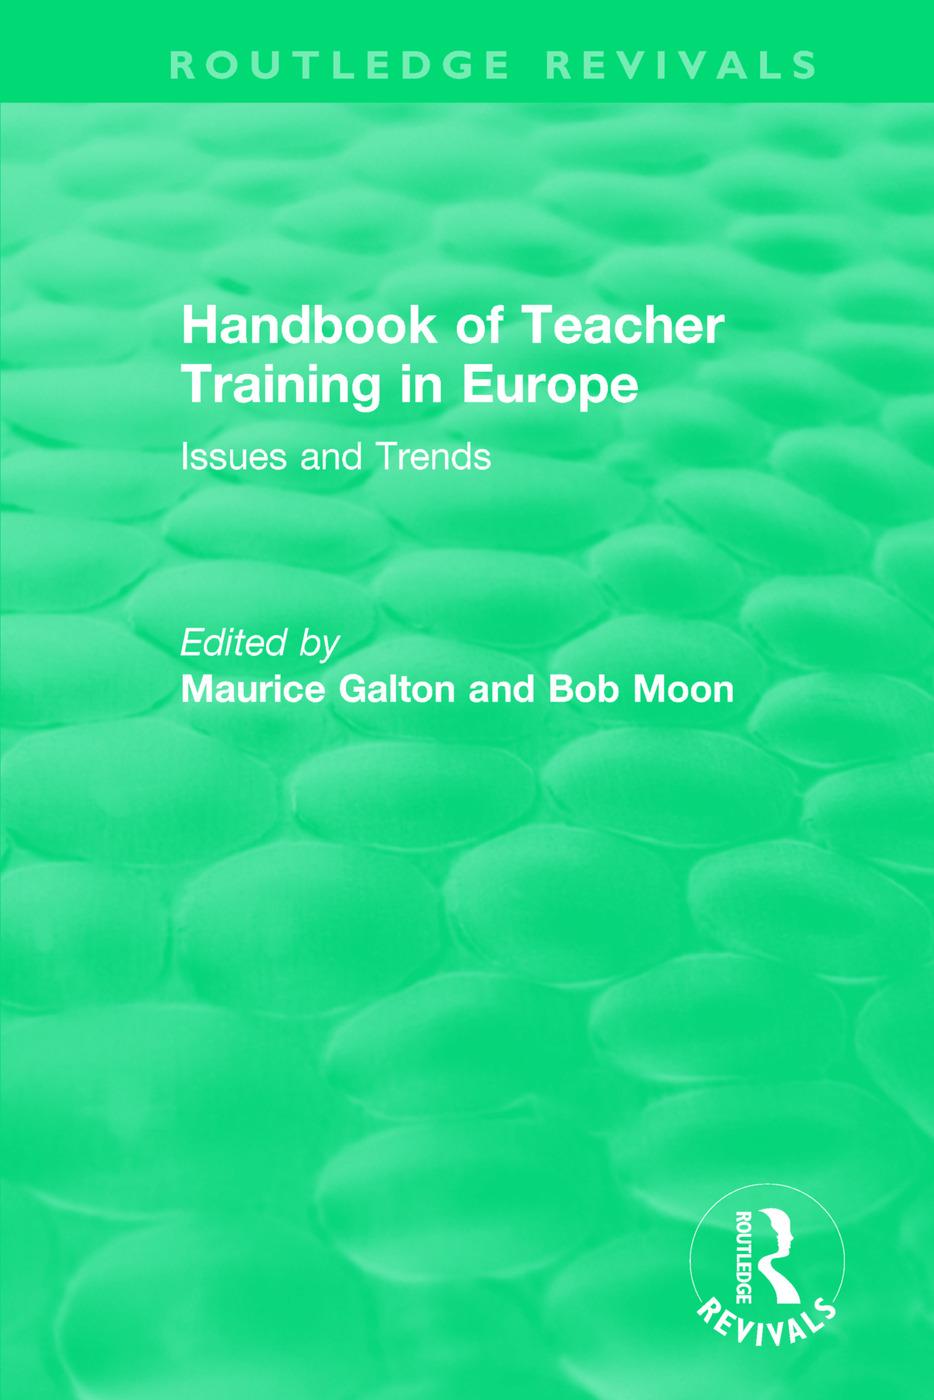 Handbook of Teacher Training in Europe (1994)